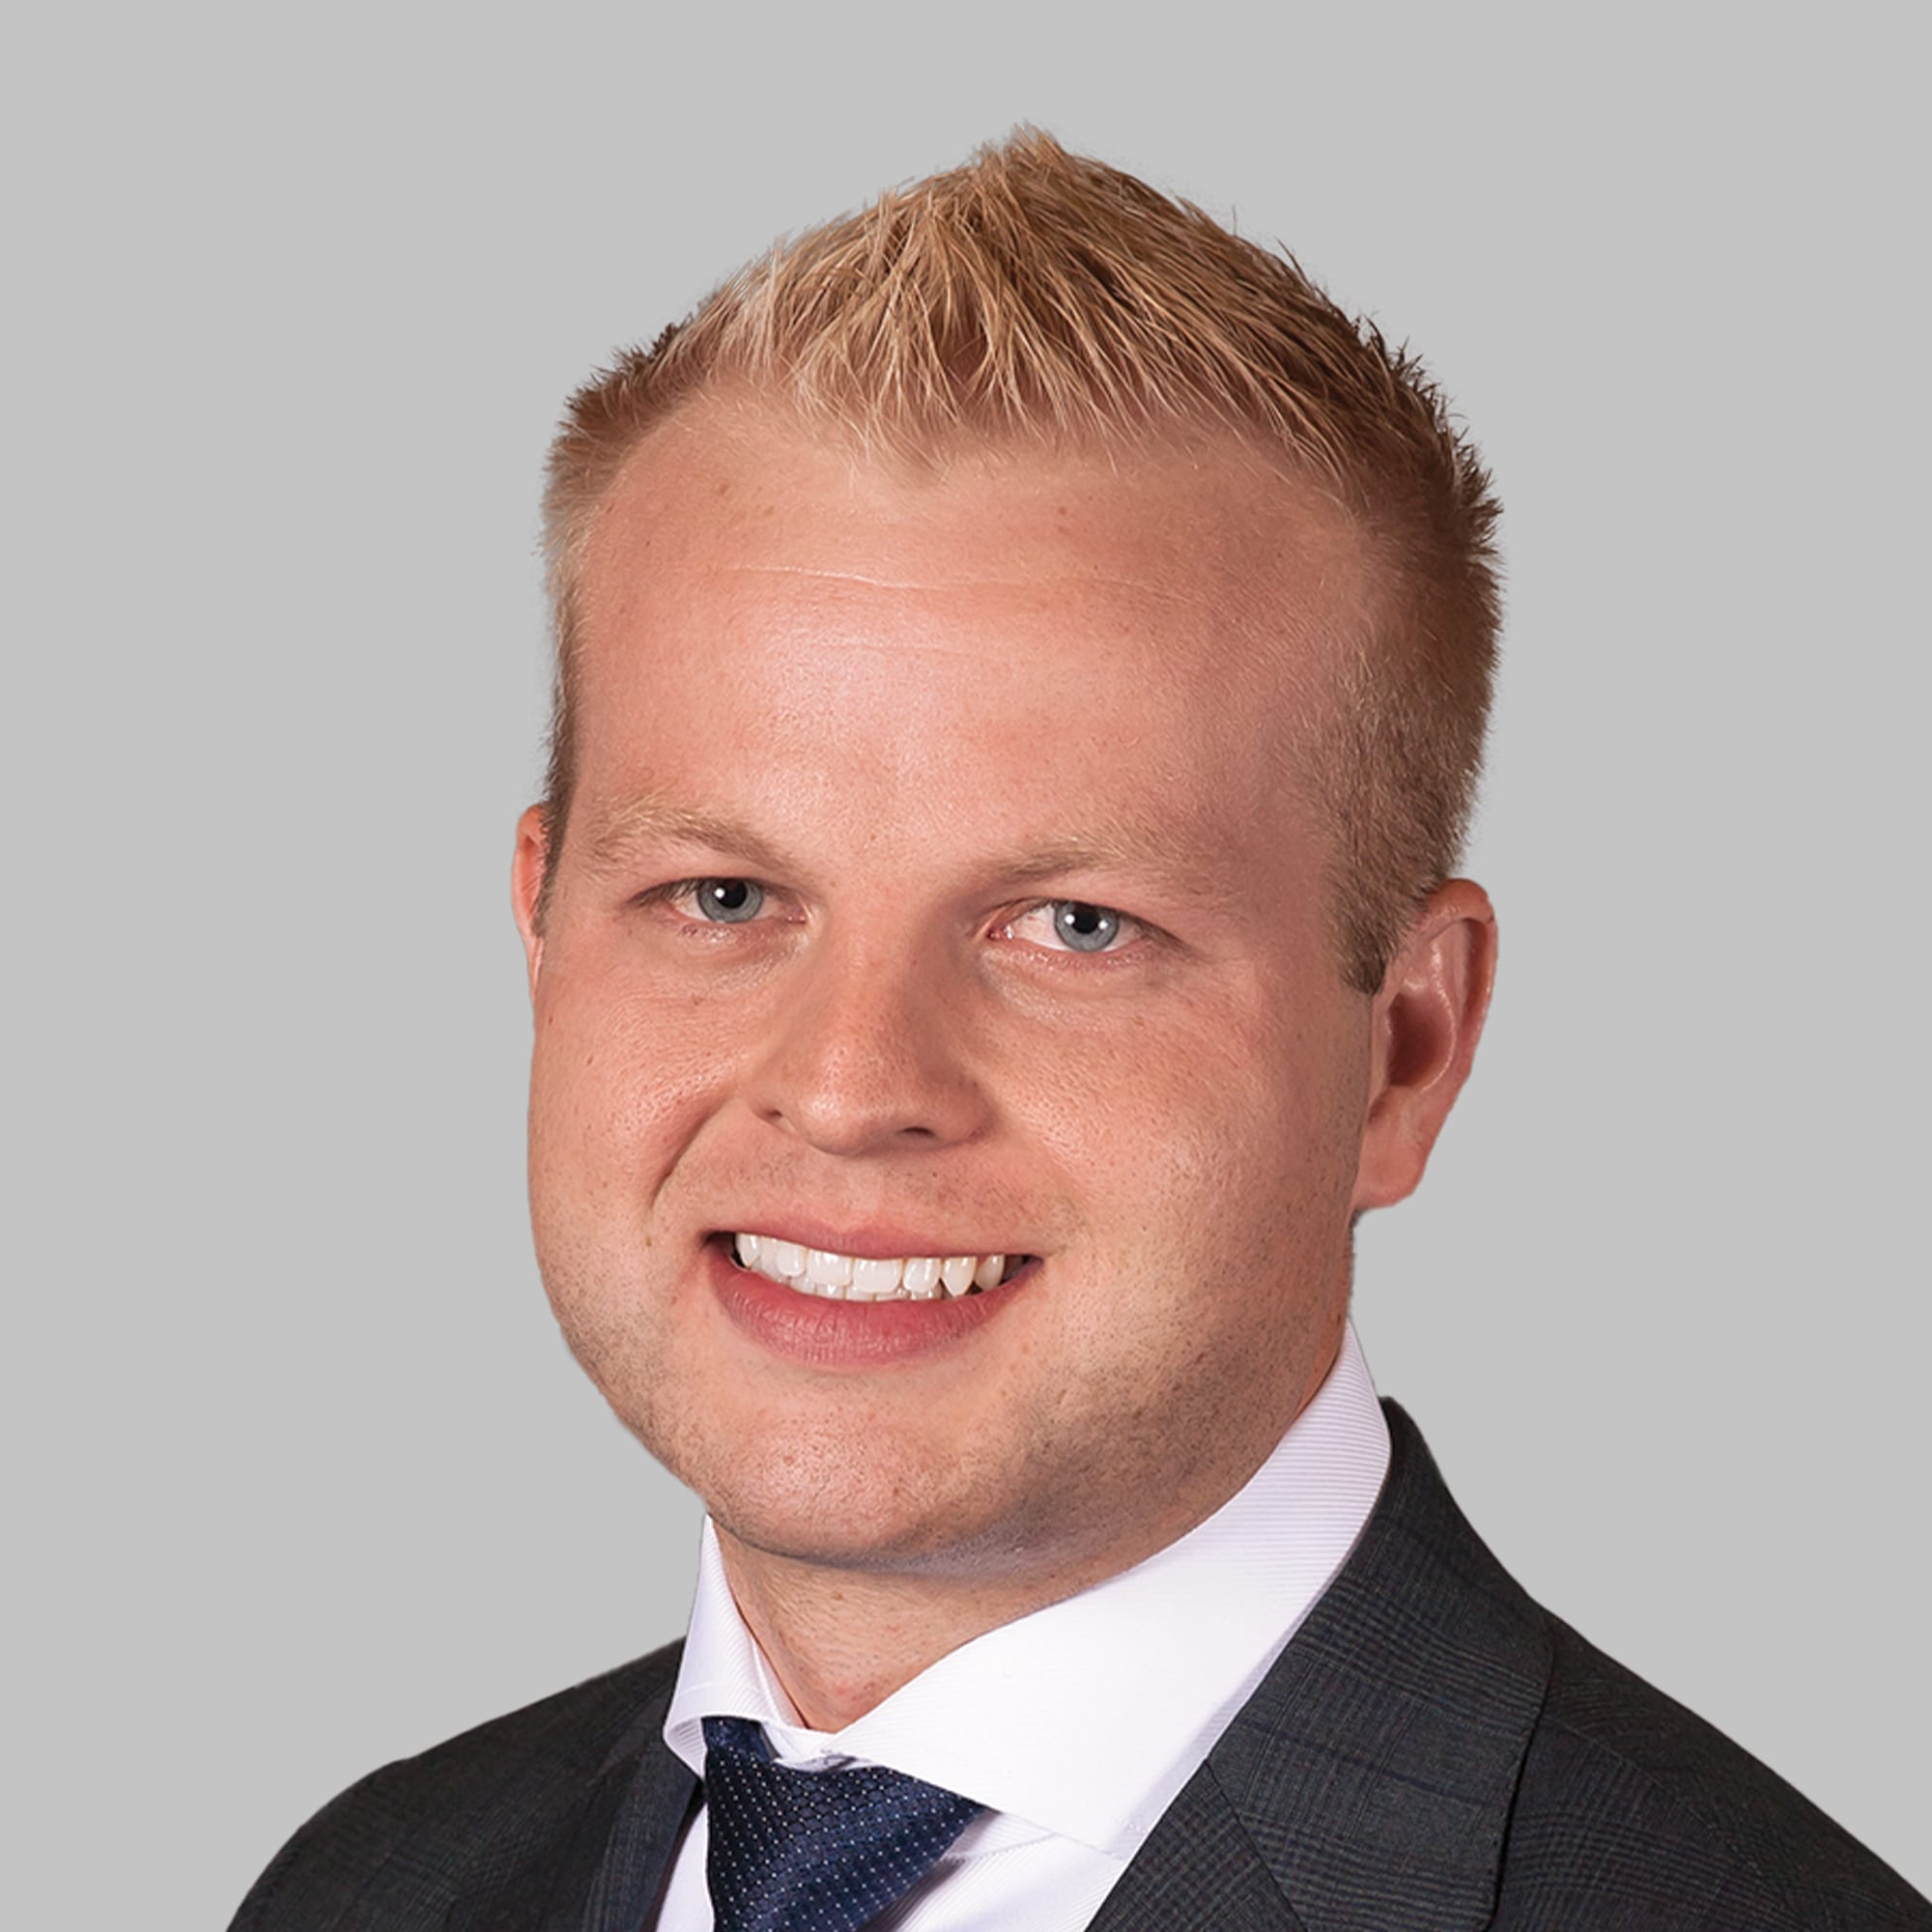 Bryce Nyberg